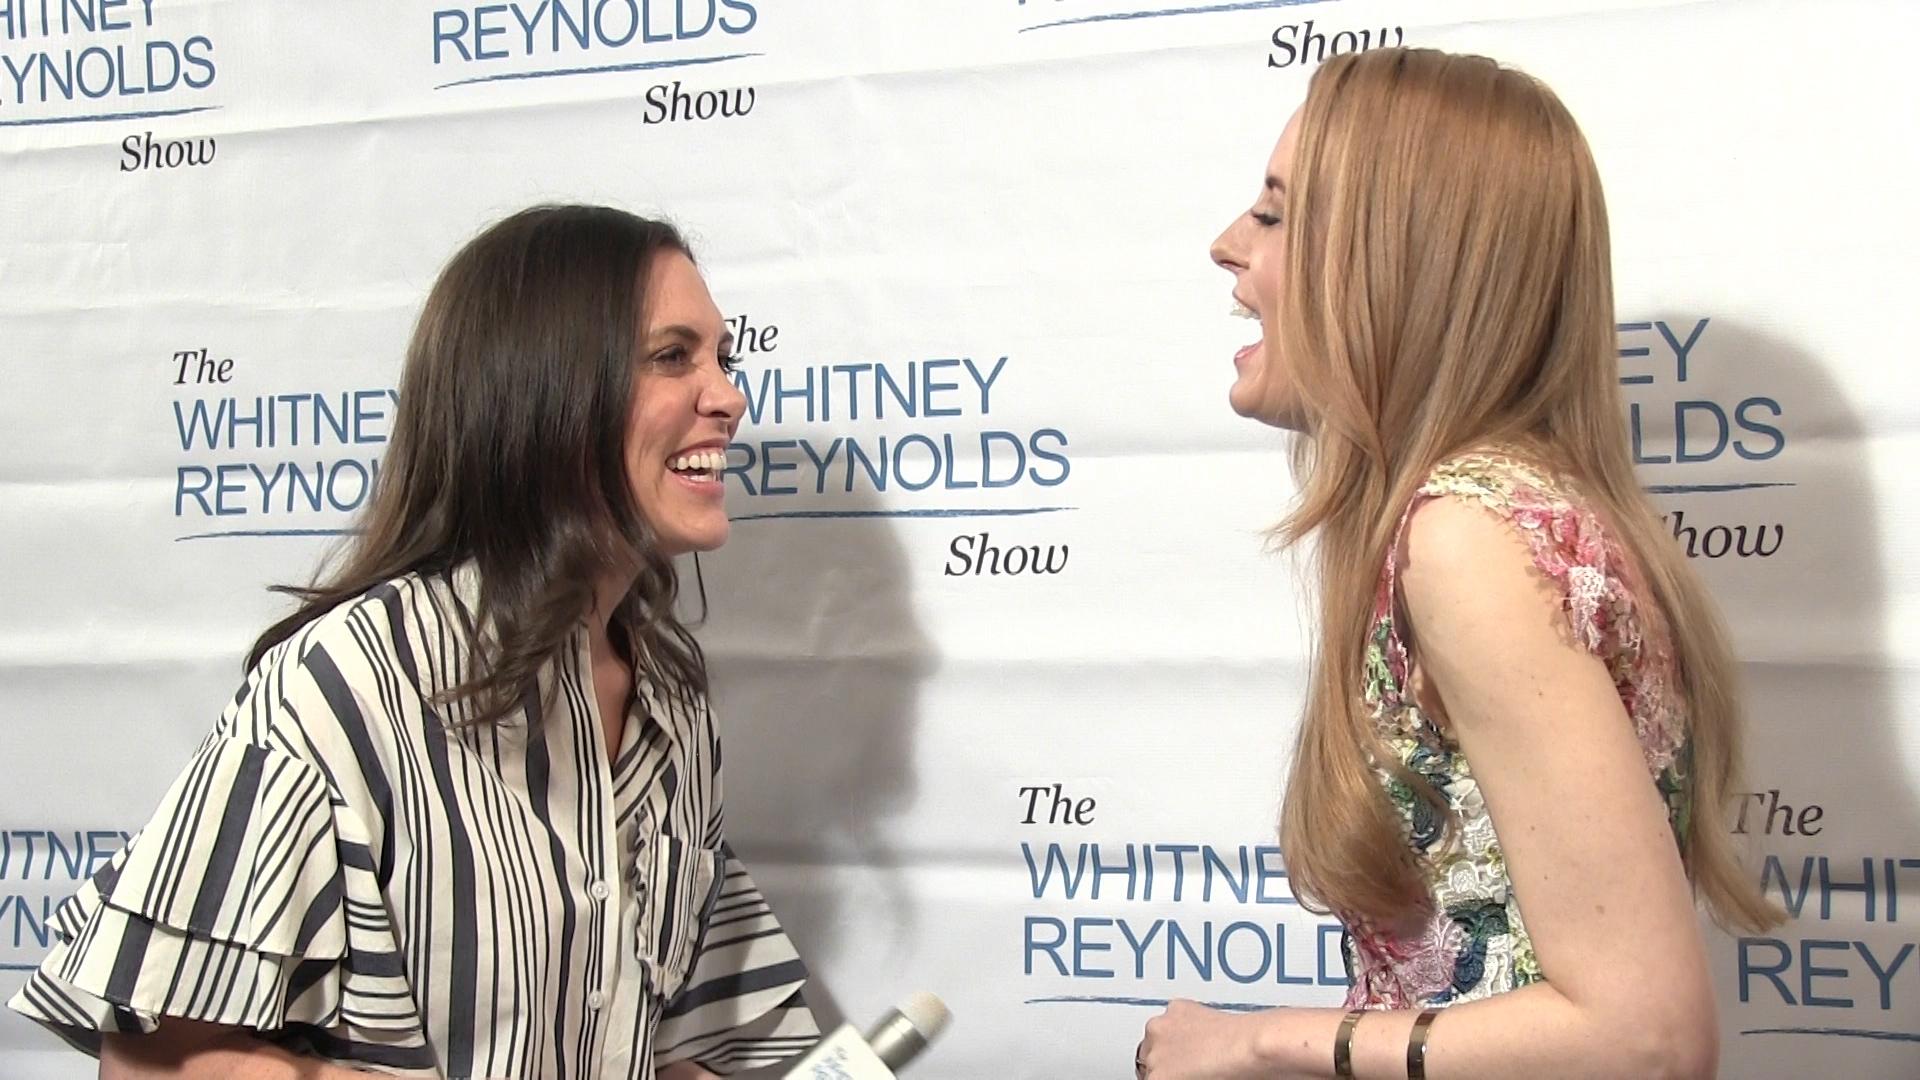 Kimberly Yates- Celebrities Care